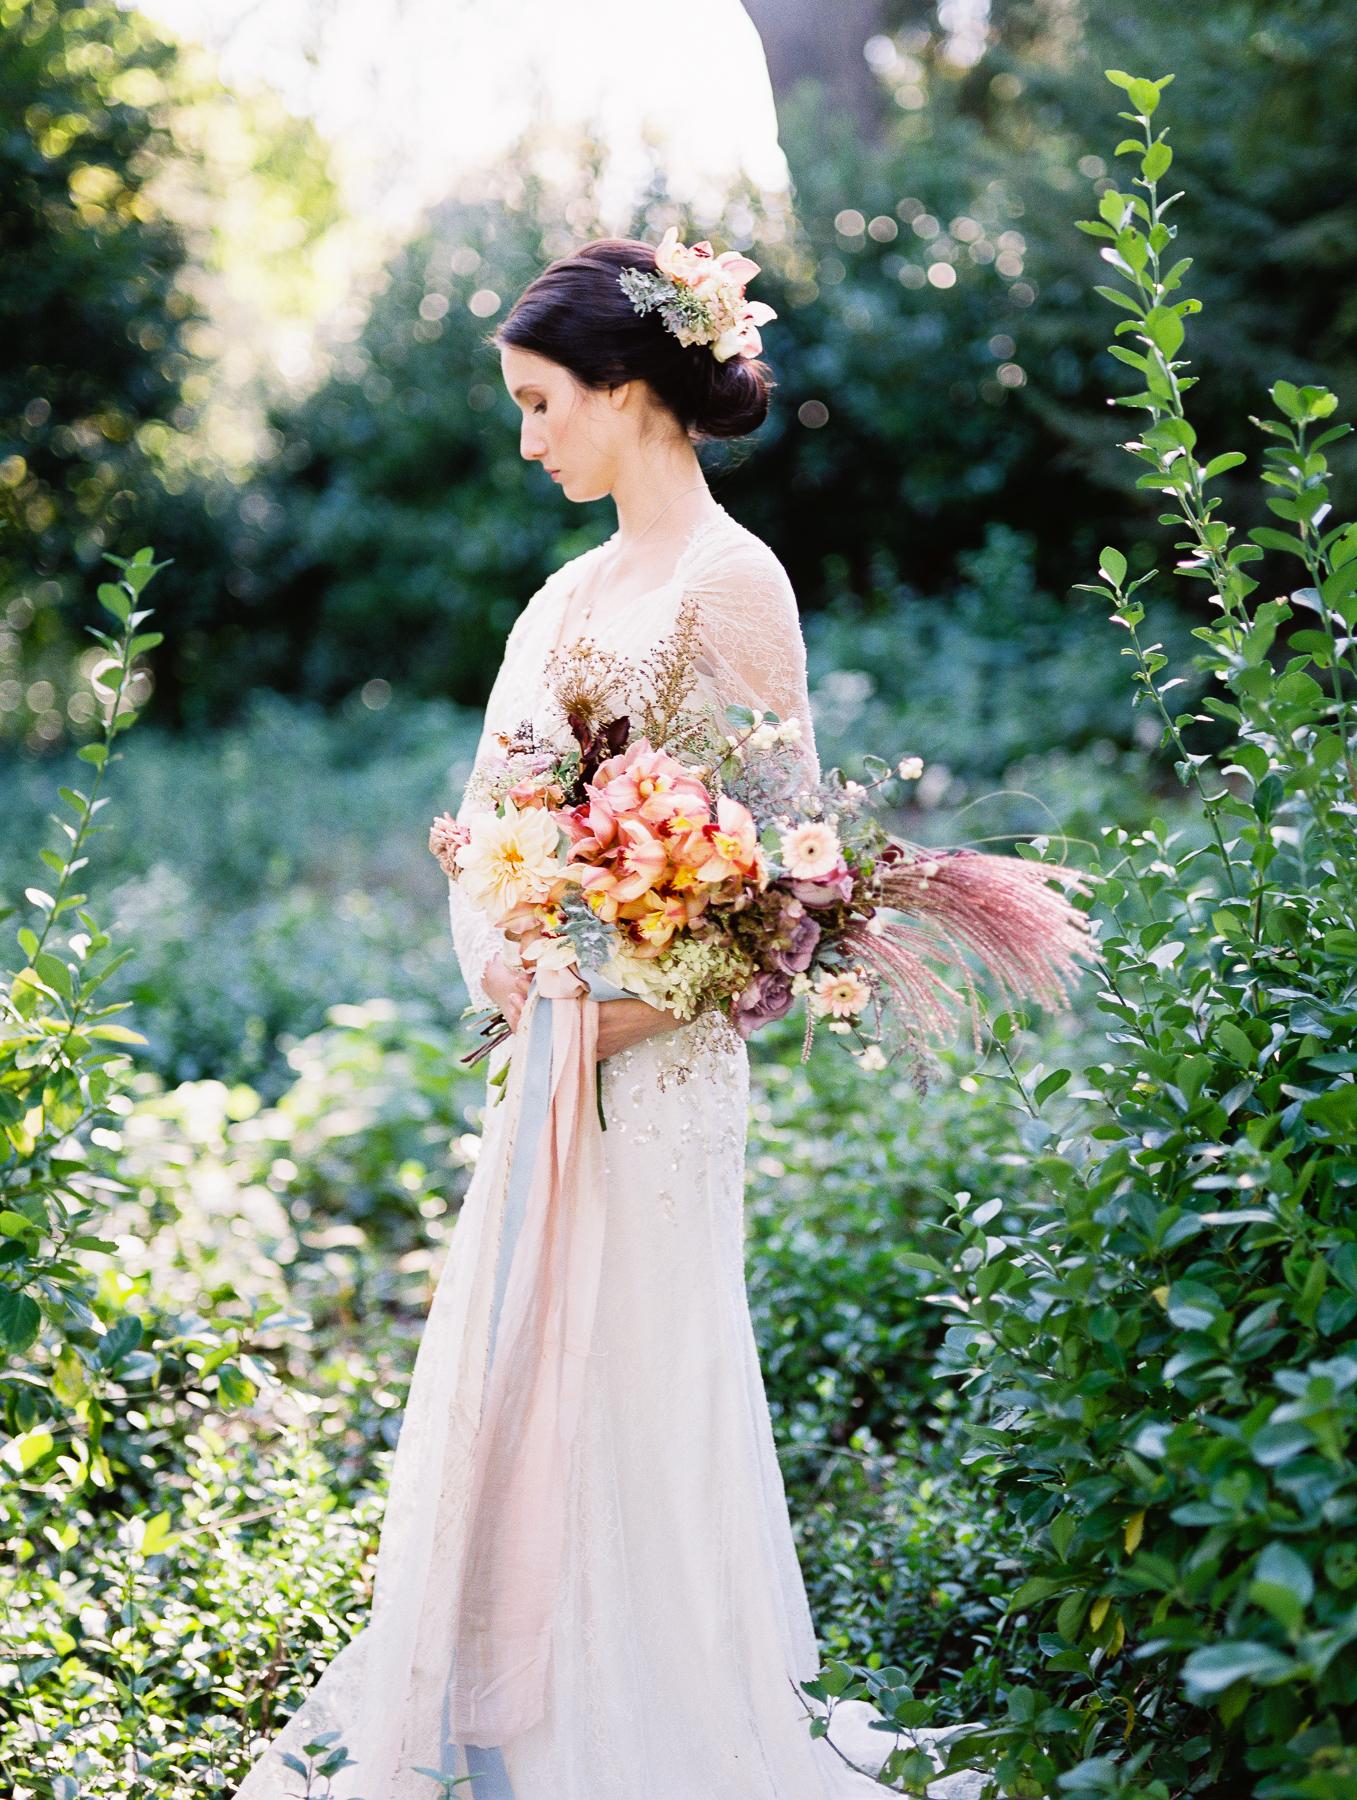 Old World Wedding Central Park NYC Romantic Bouquet Kerry Patel Designs Florist